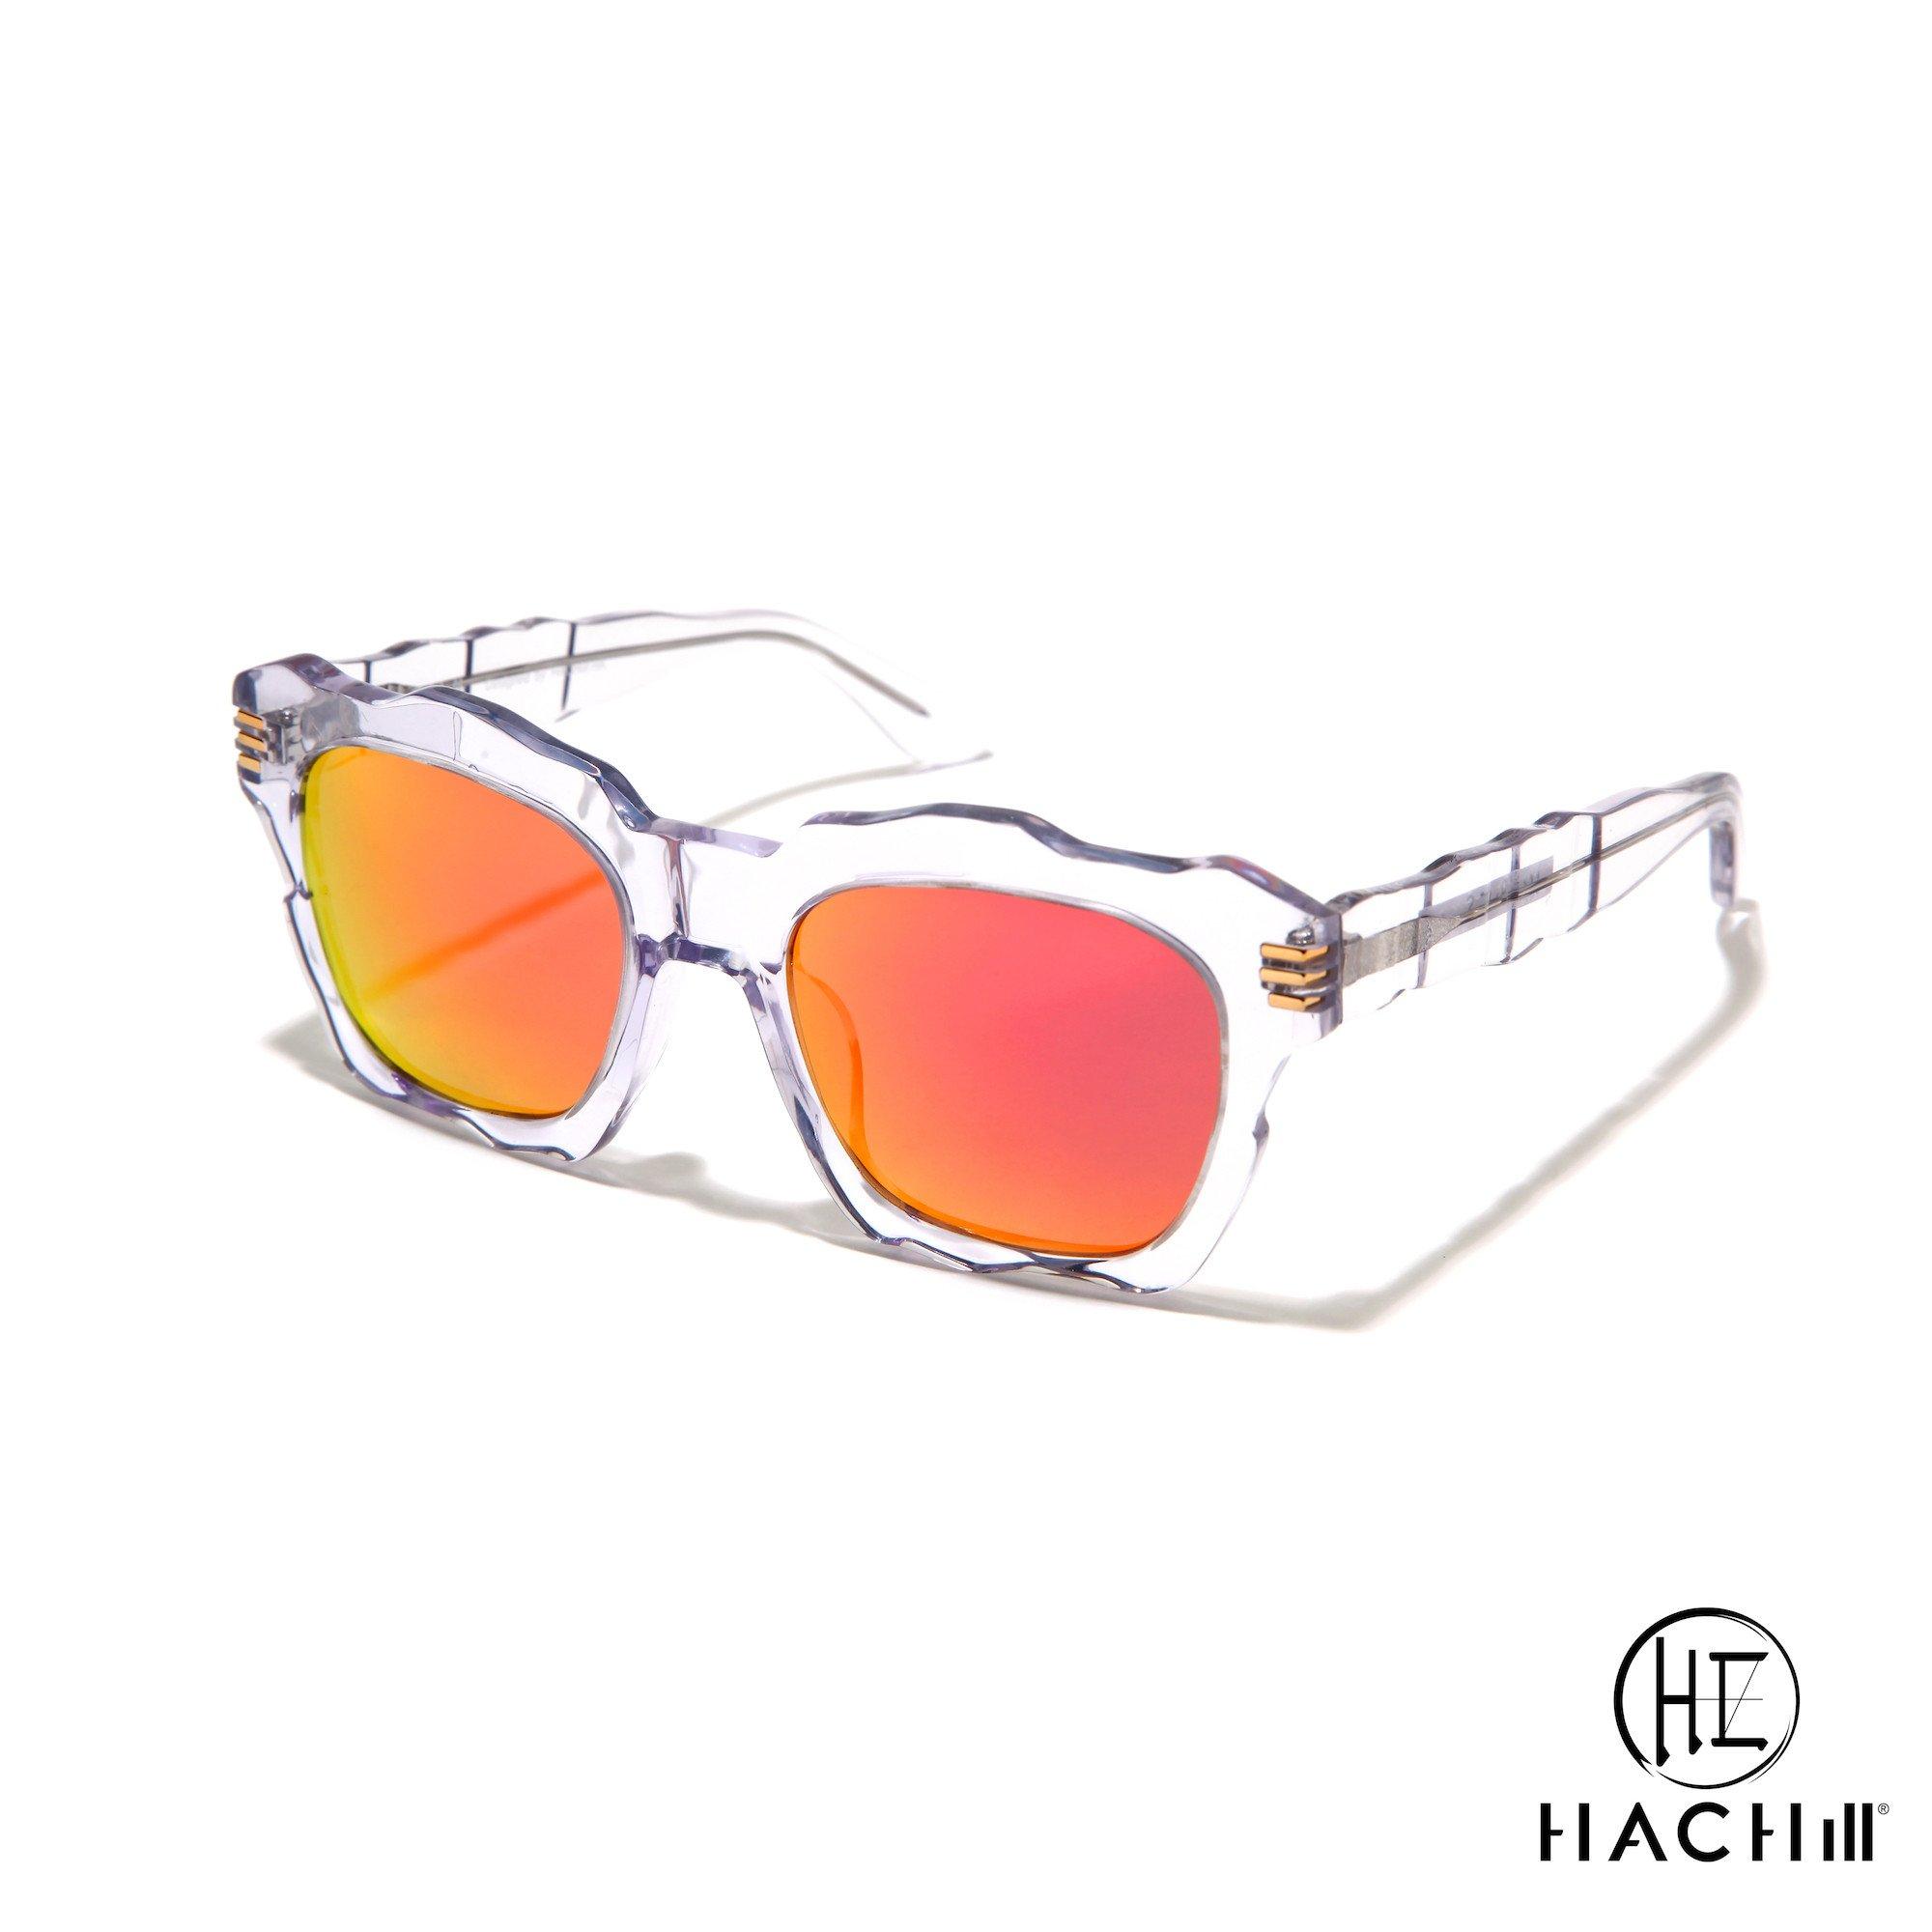 Hachill 太阳眼镜 HC8255S-C2 红色